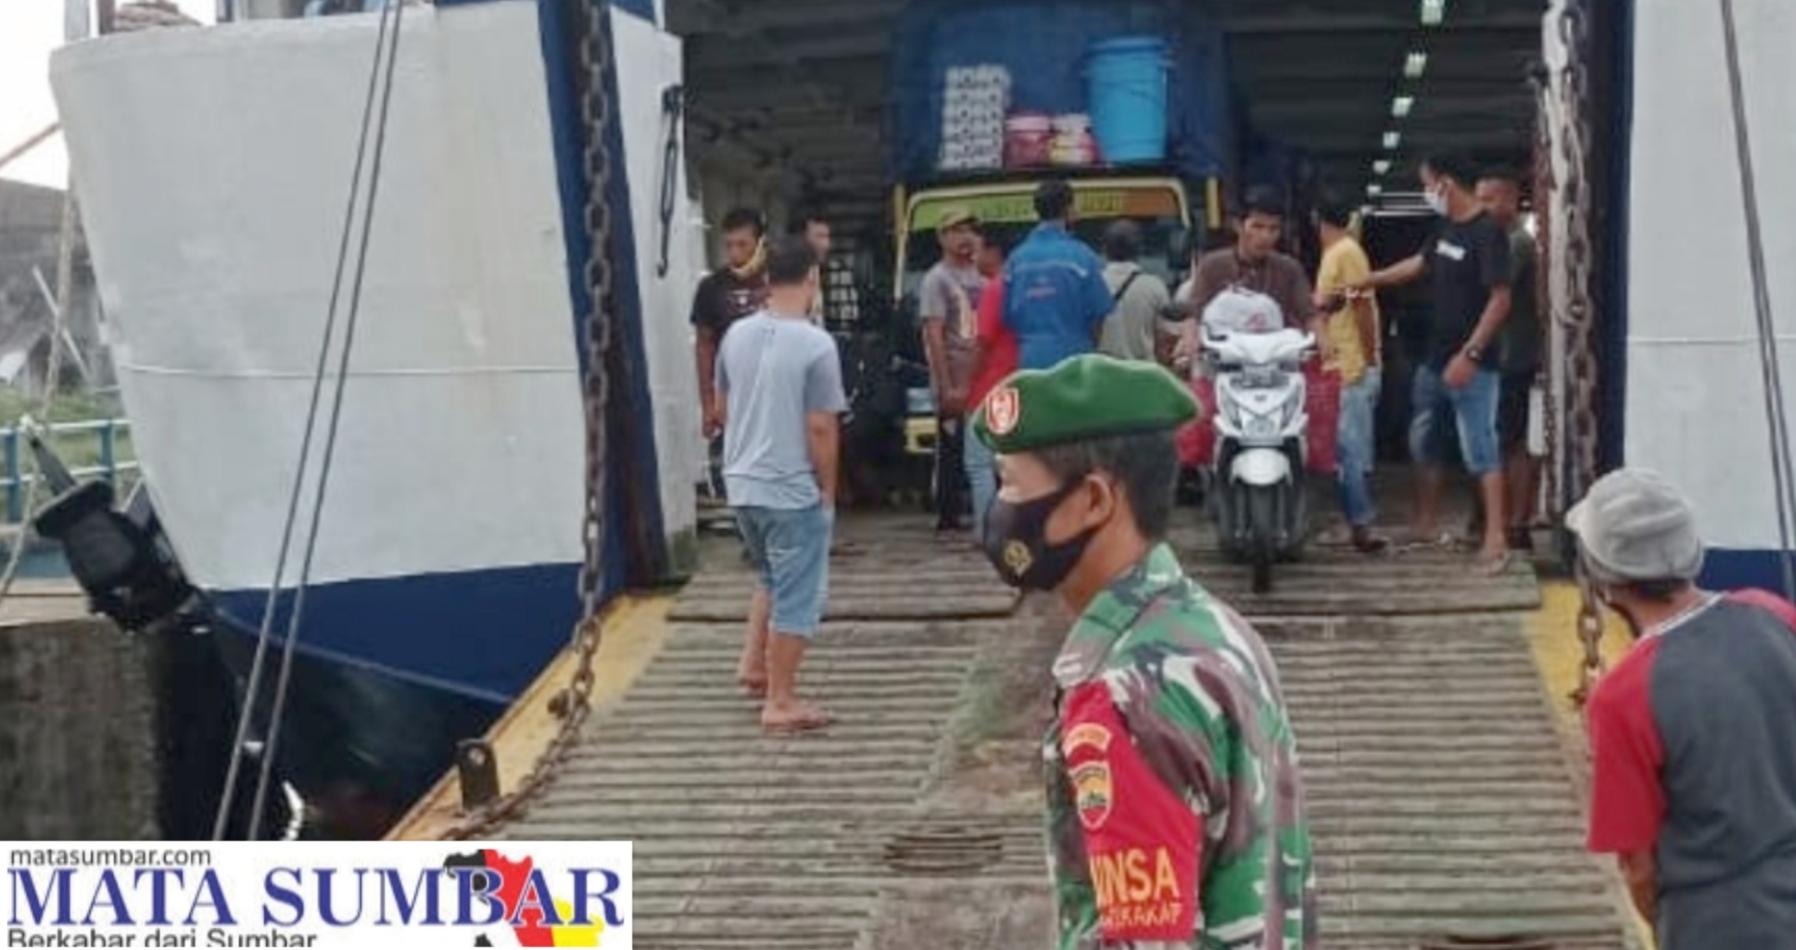 Kedatangan Kapal, Tim Satgas Bersama Babinsa Lakukan Pengawasan Disiplin Prokes